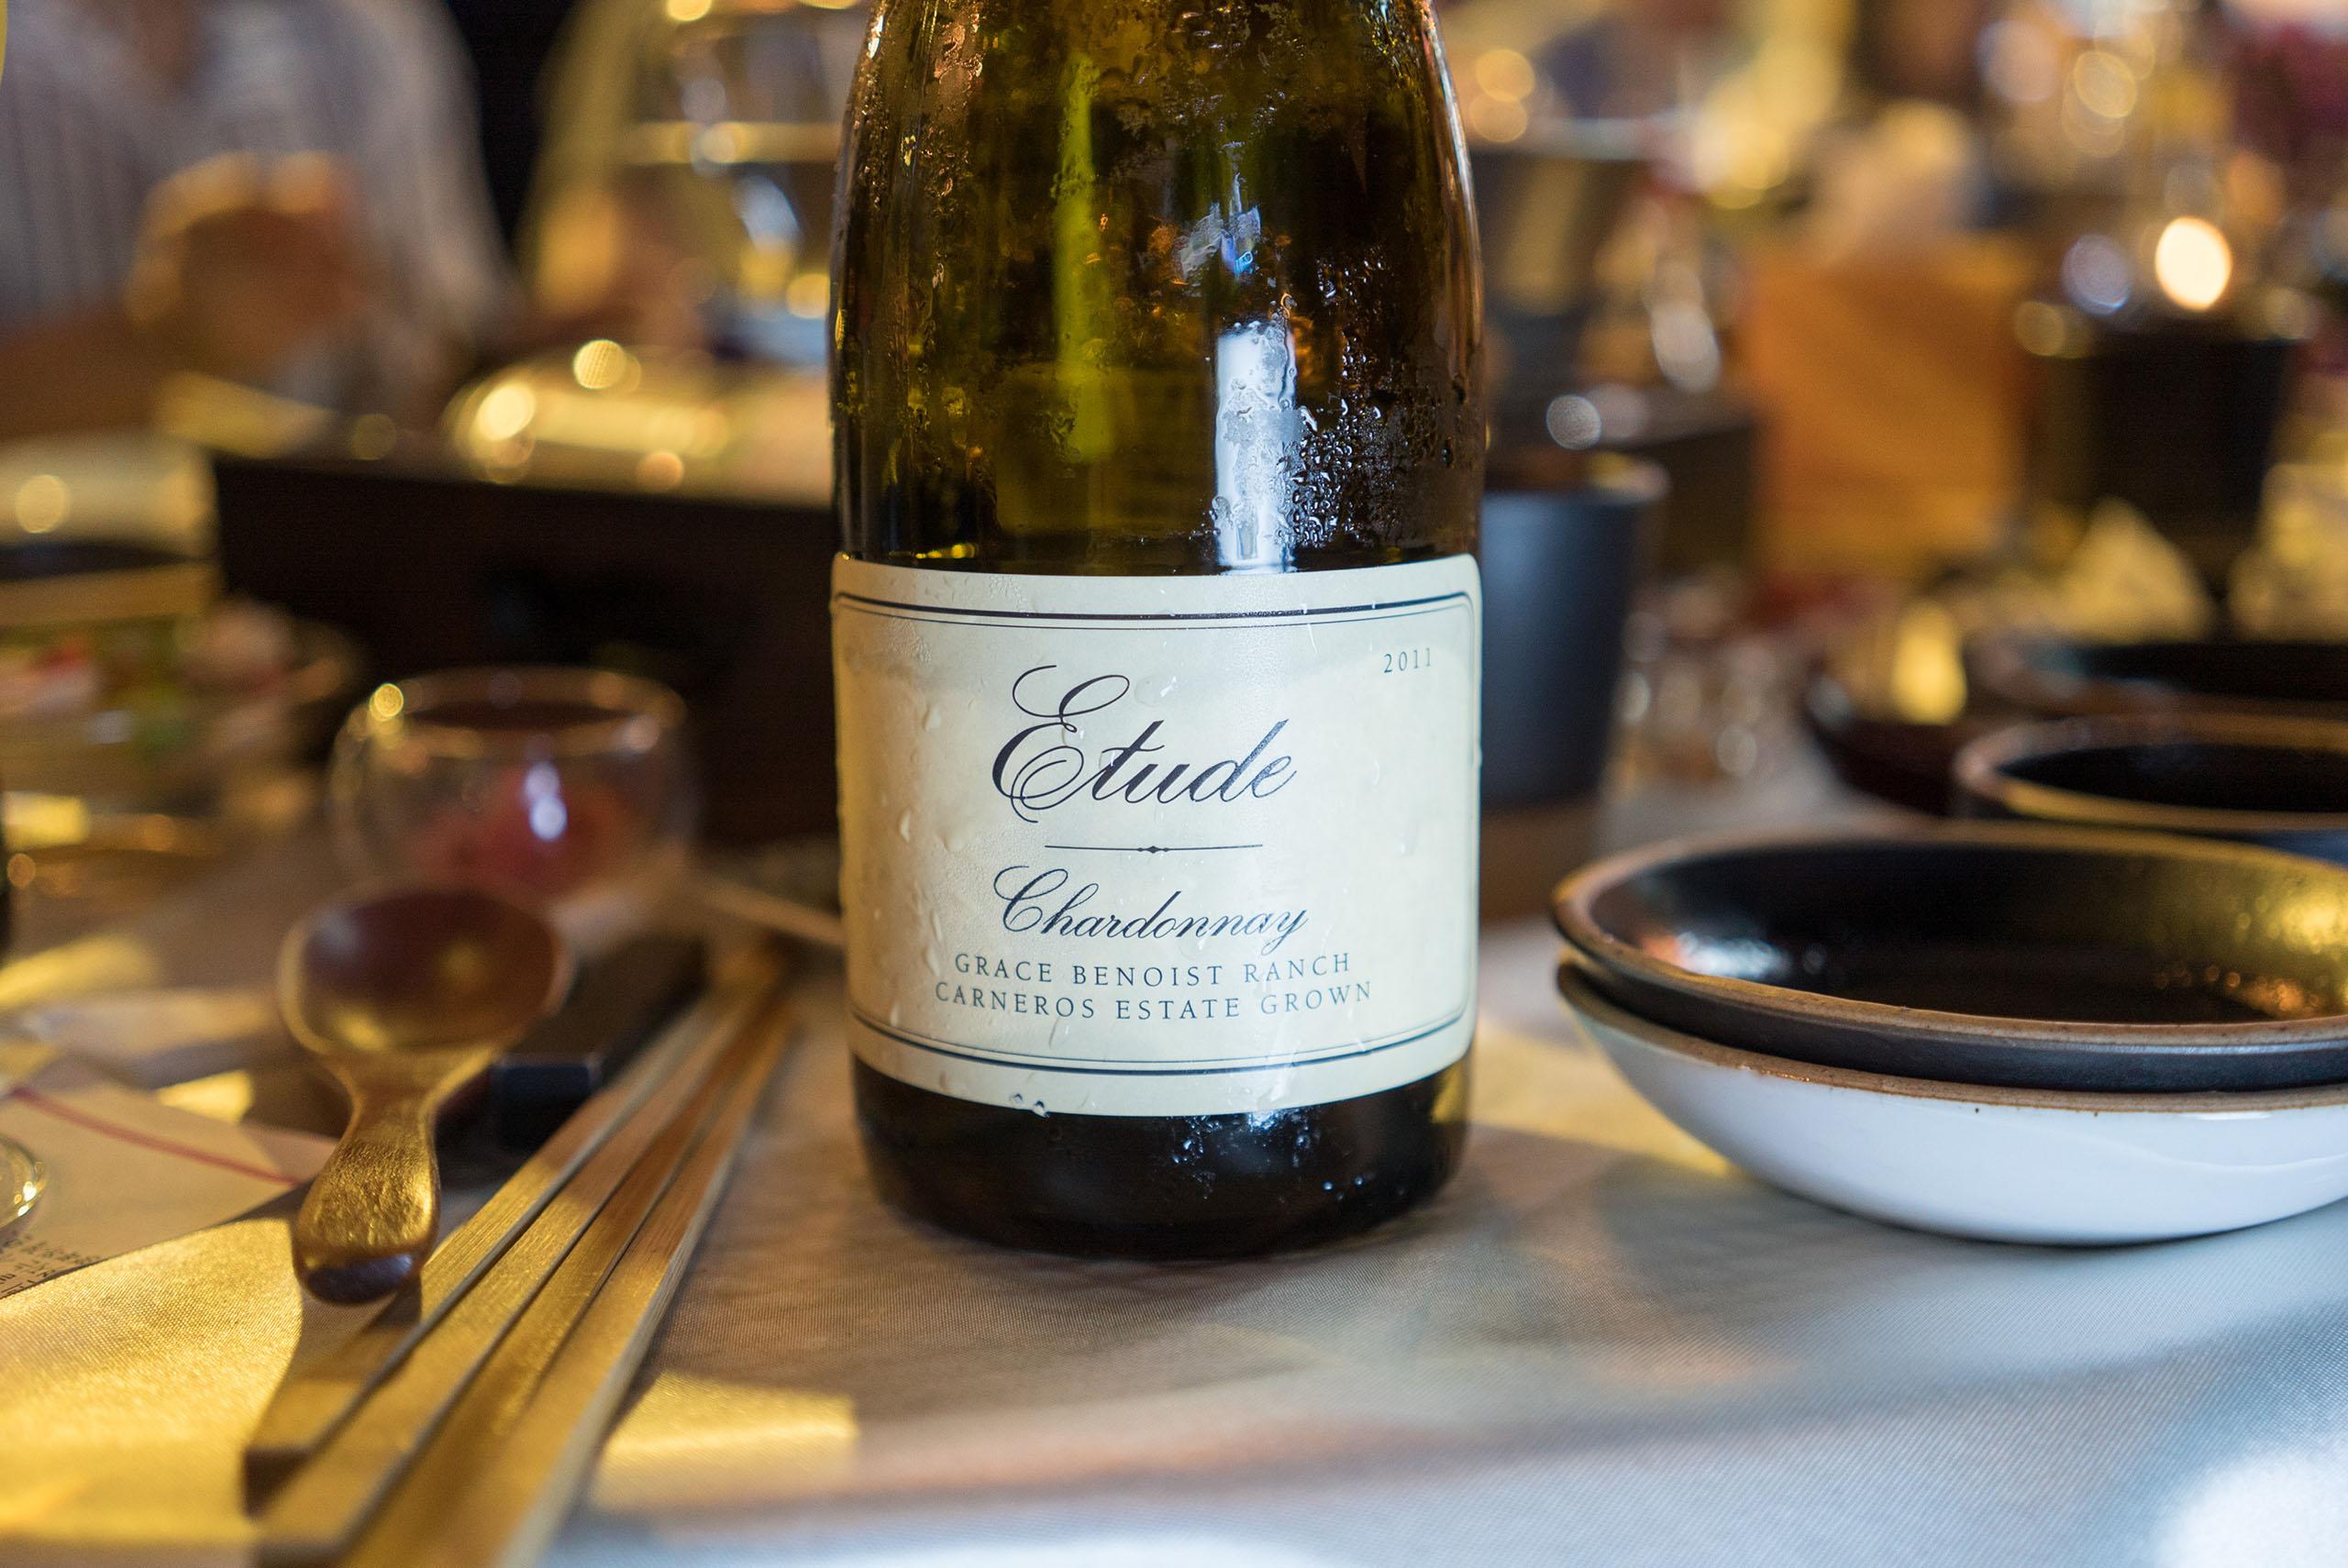 Etude Chardonnay 2011